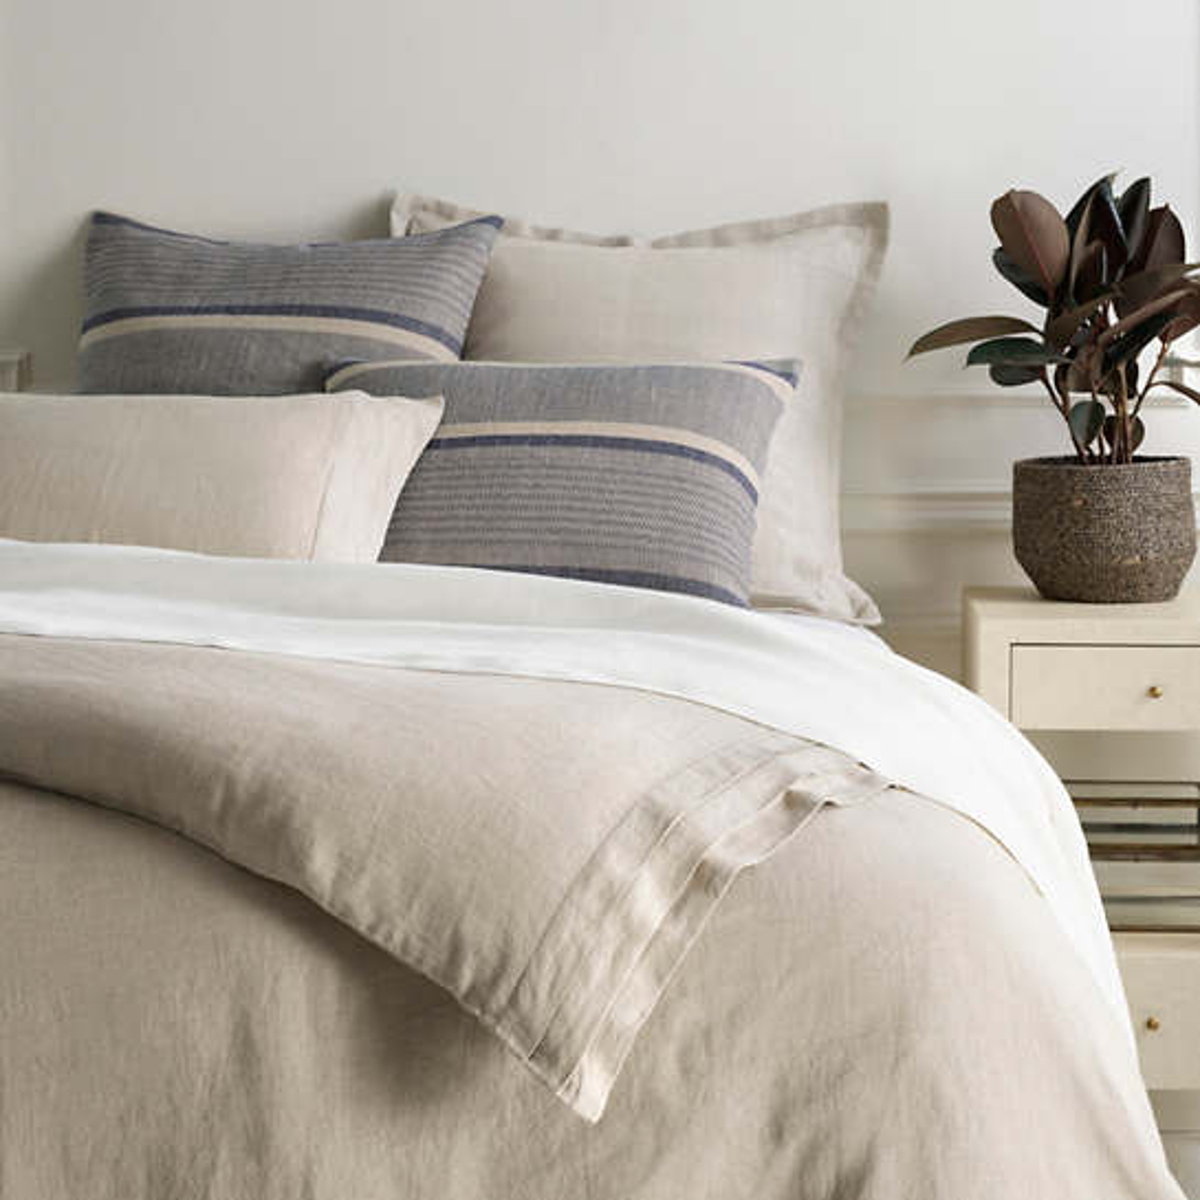 Pleated Linen Natural Duvet Cover